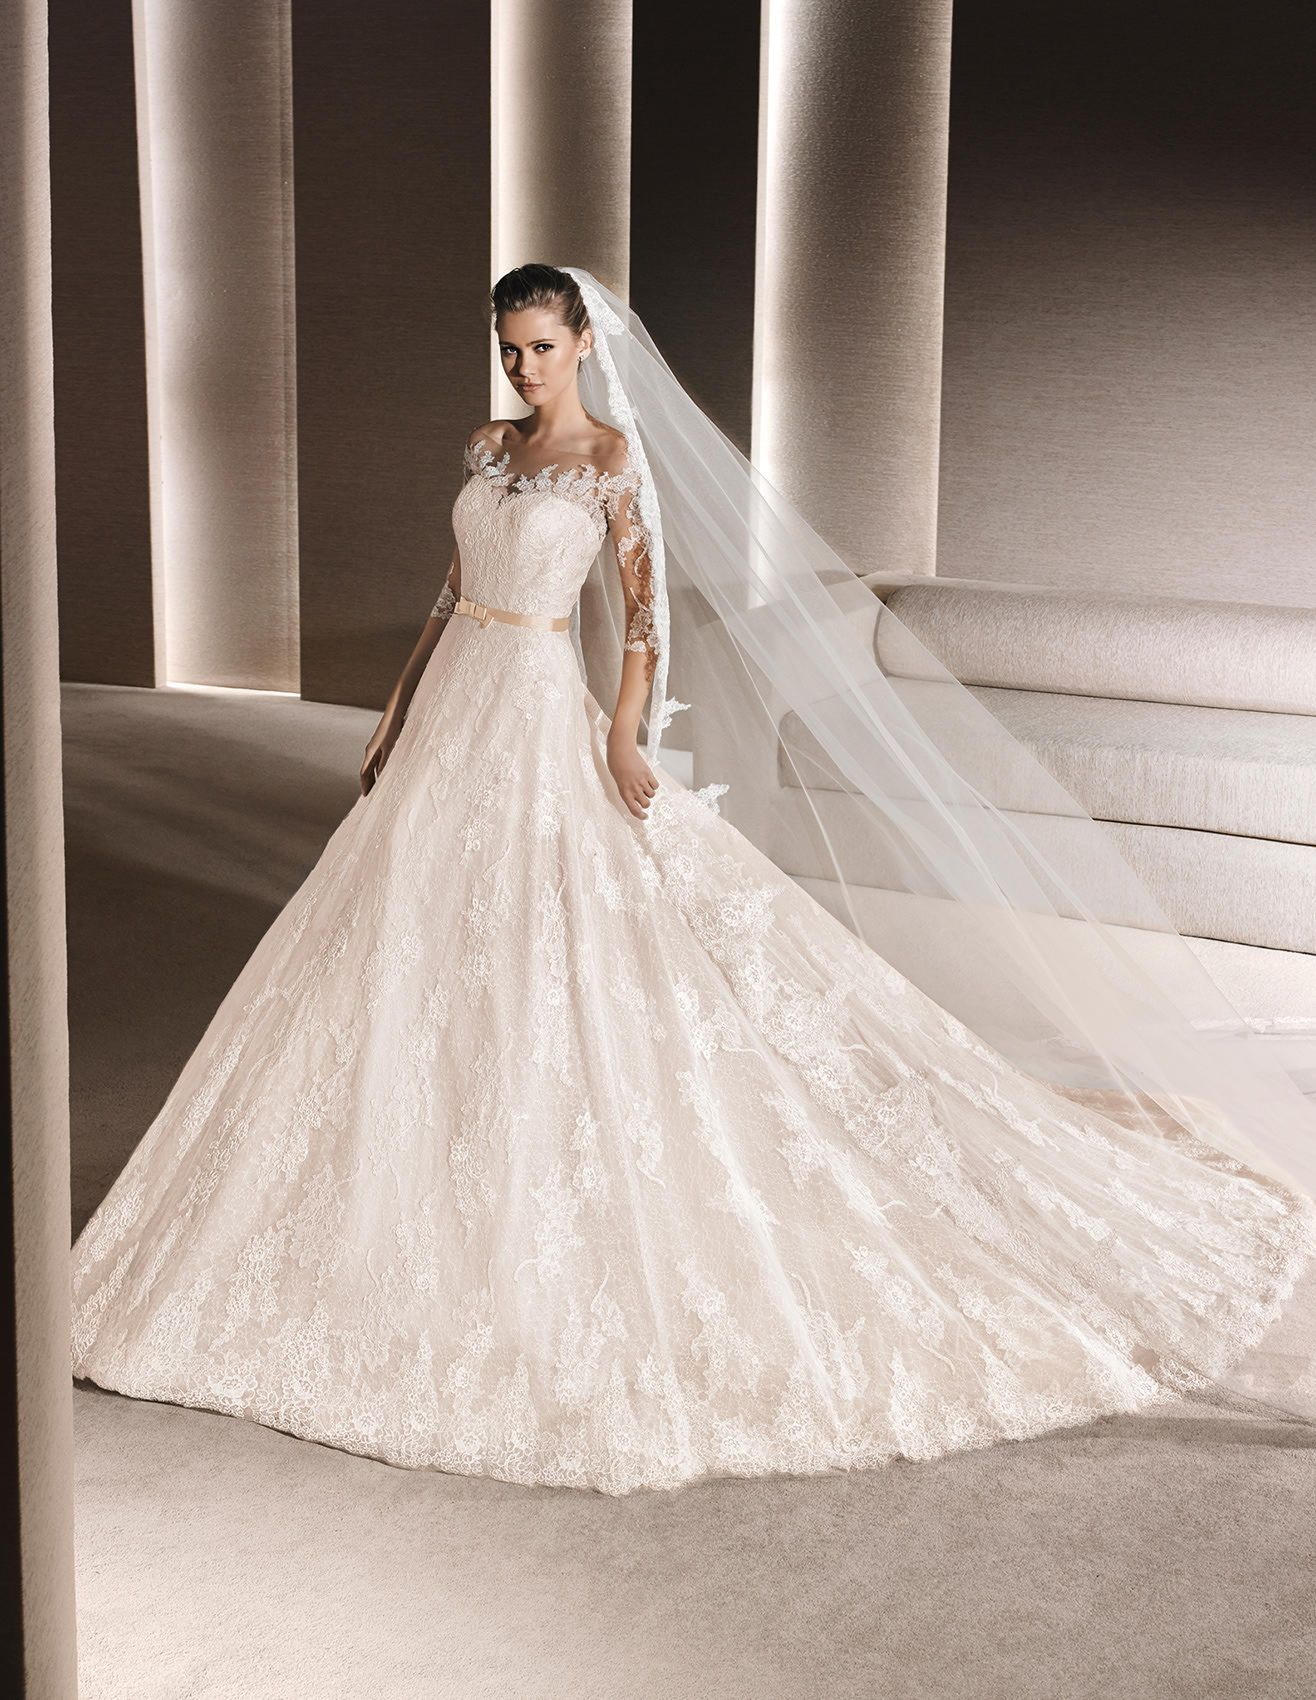 5458fac126ec ROSINE - Lace wedding dress, with sweetheart neckline | La Sposa ...